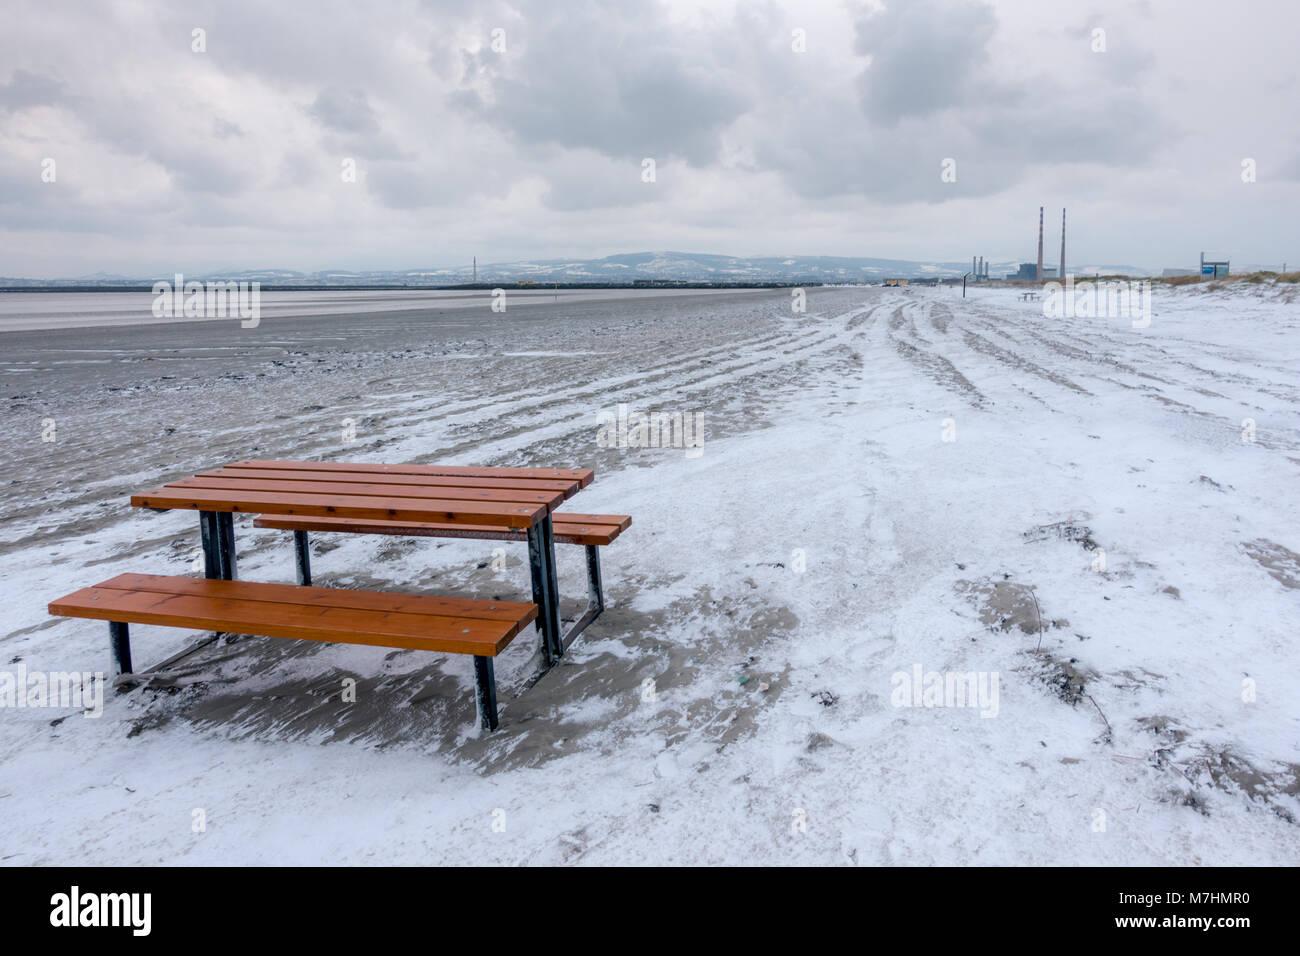 Winter on the beach in Ireland - Stock Image